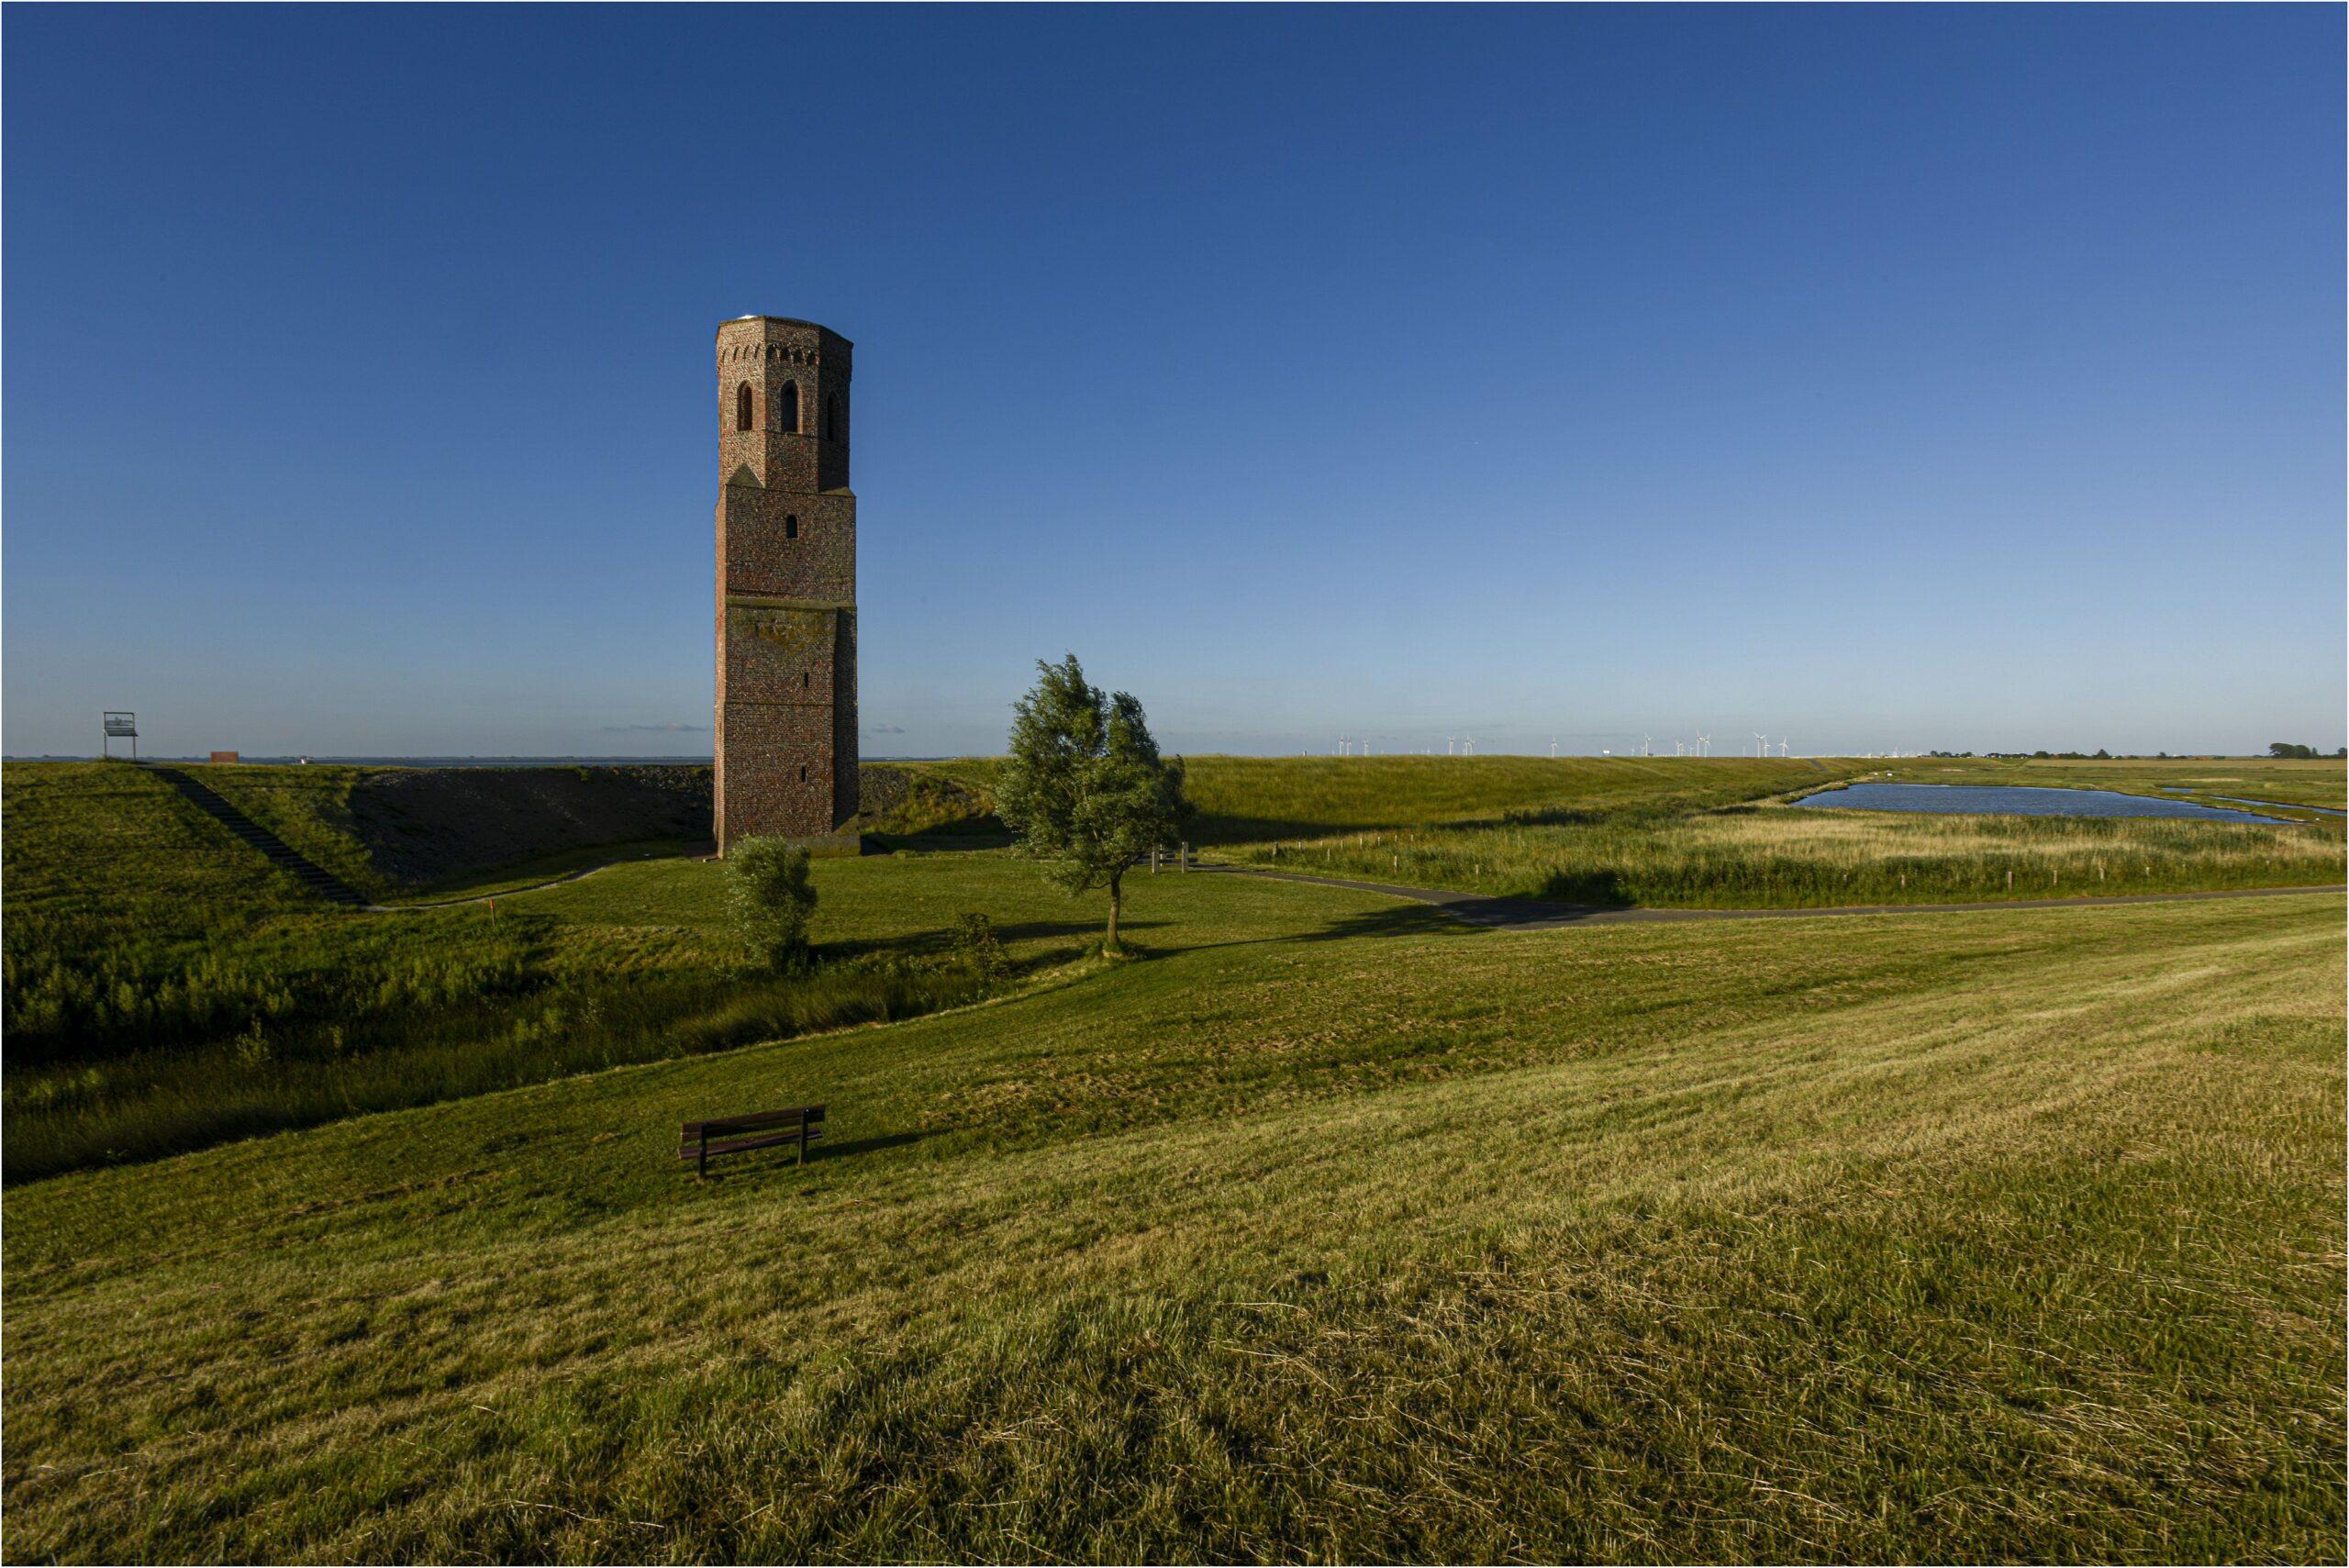 Plompe Toren (foto Ton Stanowicki, www.beeldbank.zeeland.nl).